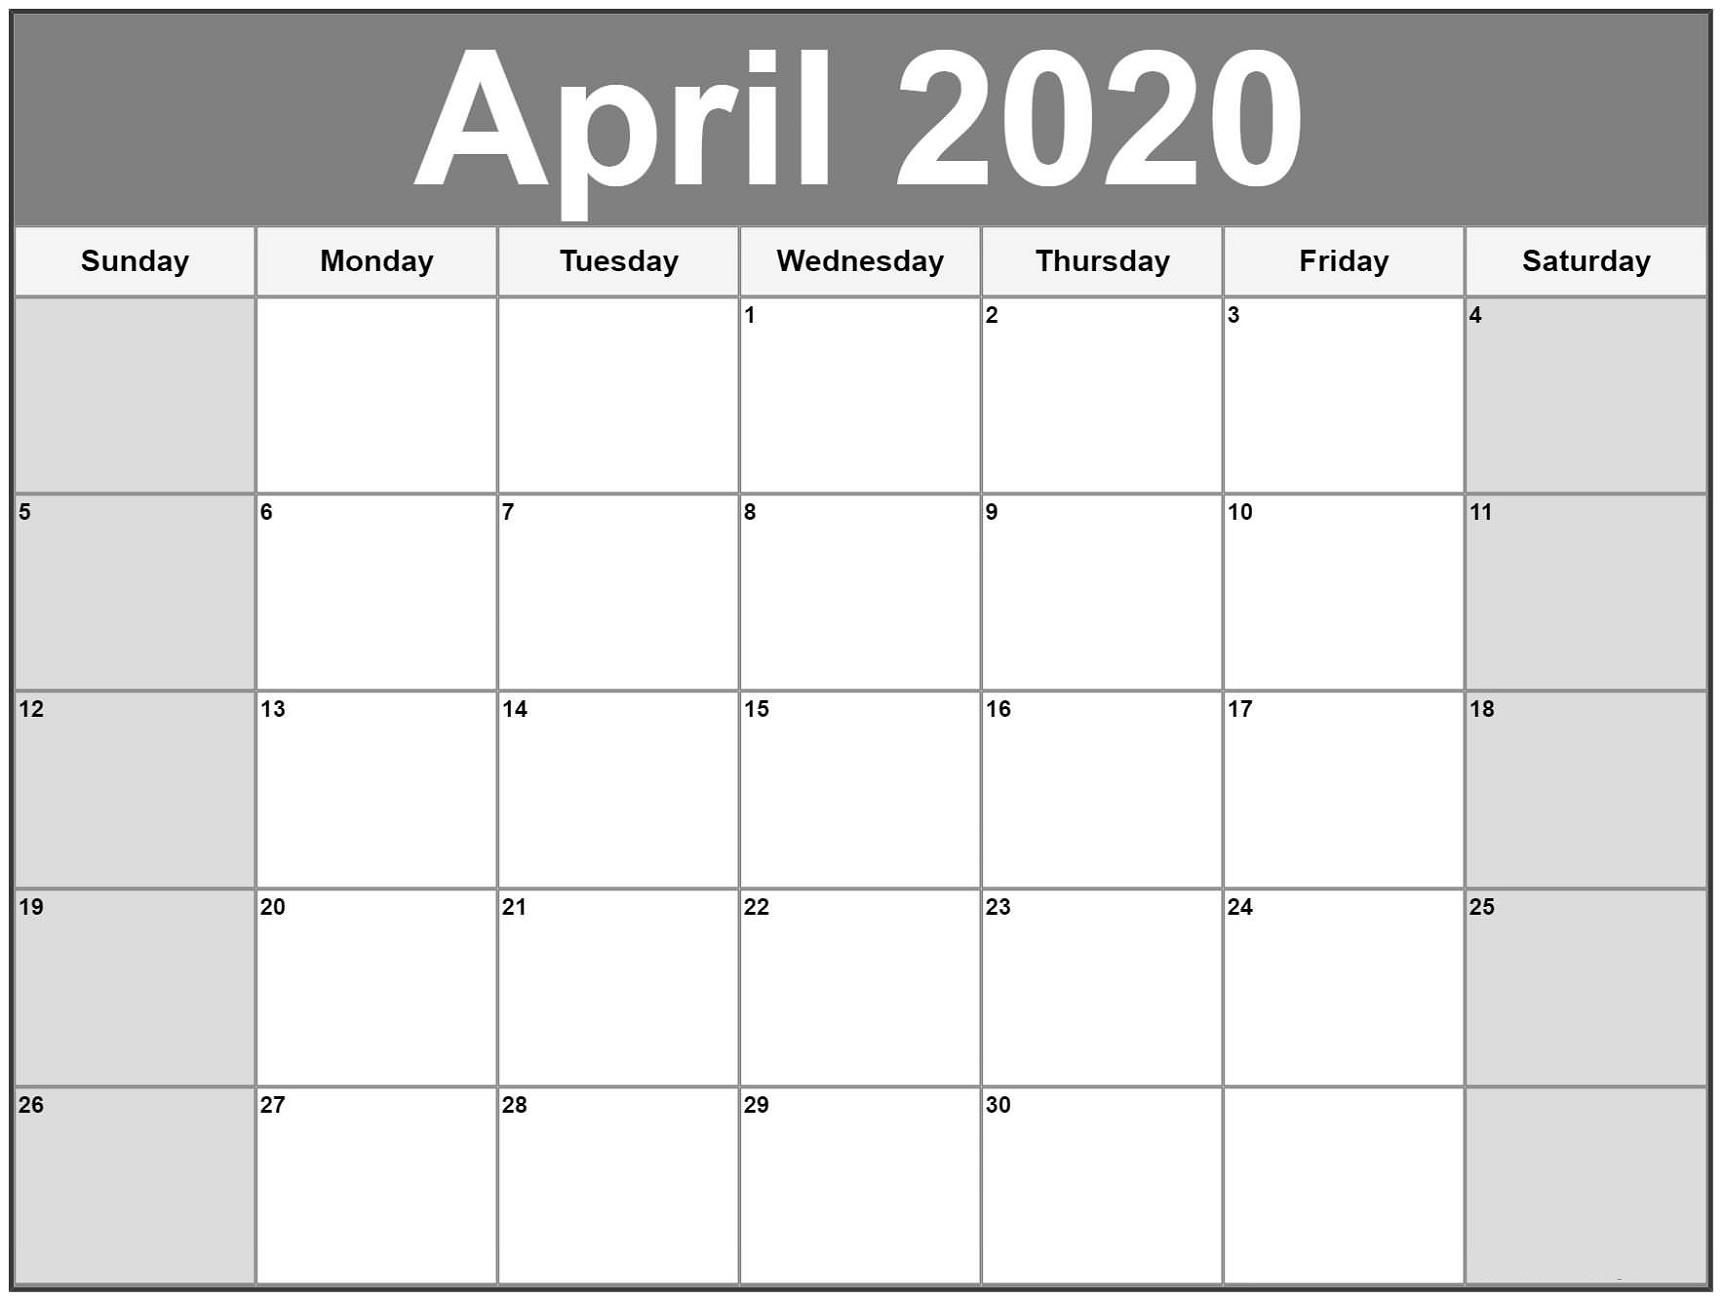 Free Printable Calendar 2020 | Calendar Shelter Free Very Large Squares Blank Printable Calendar 2020 Monthly